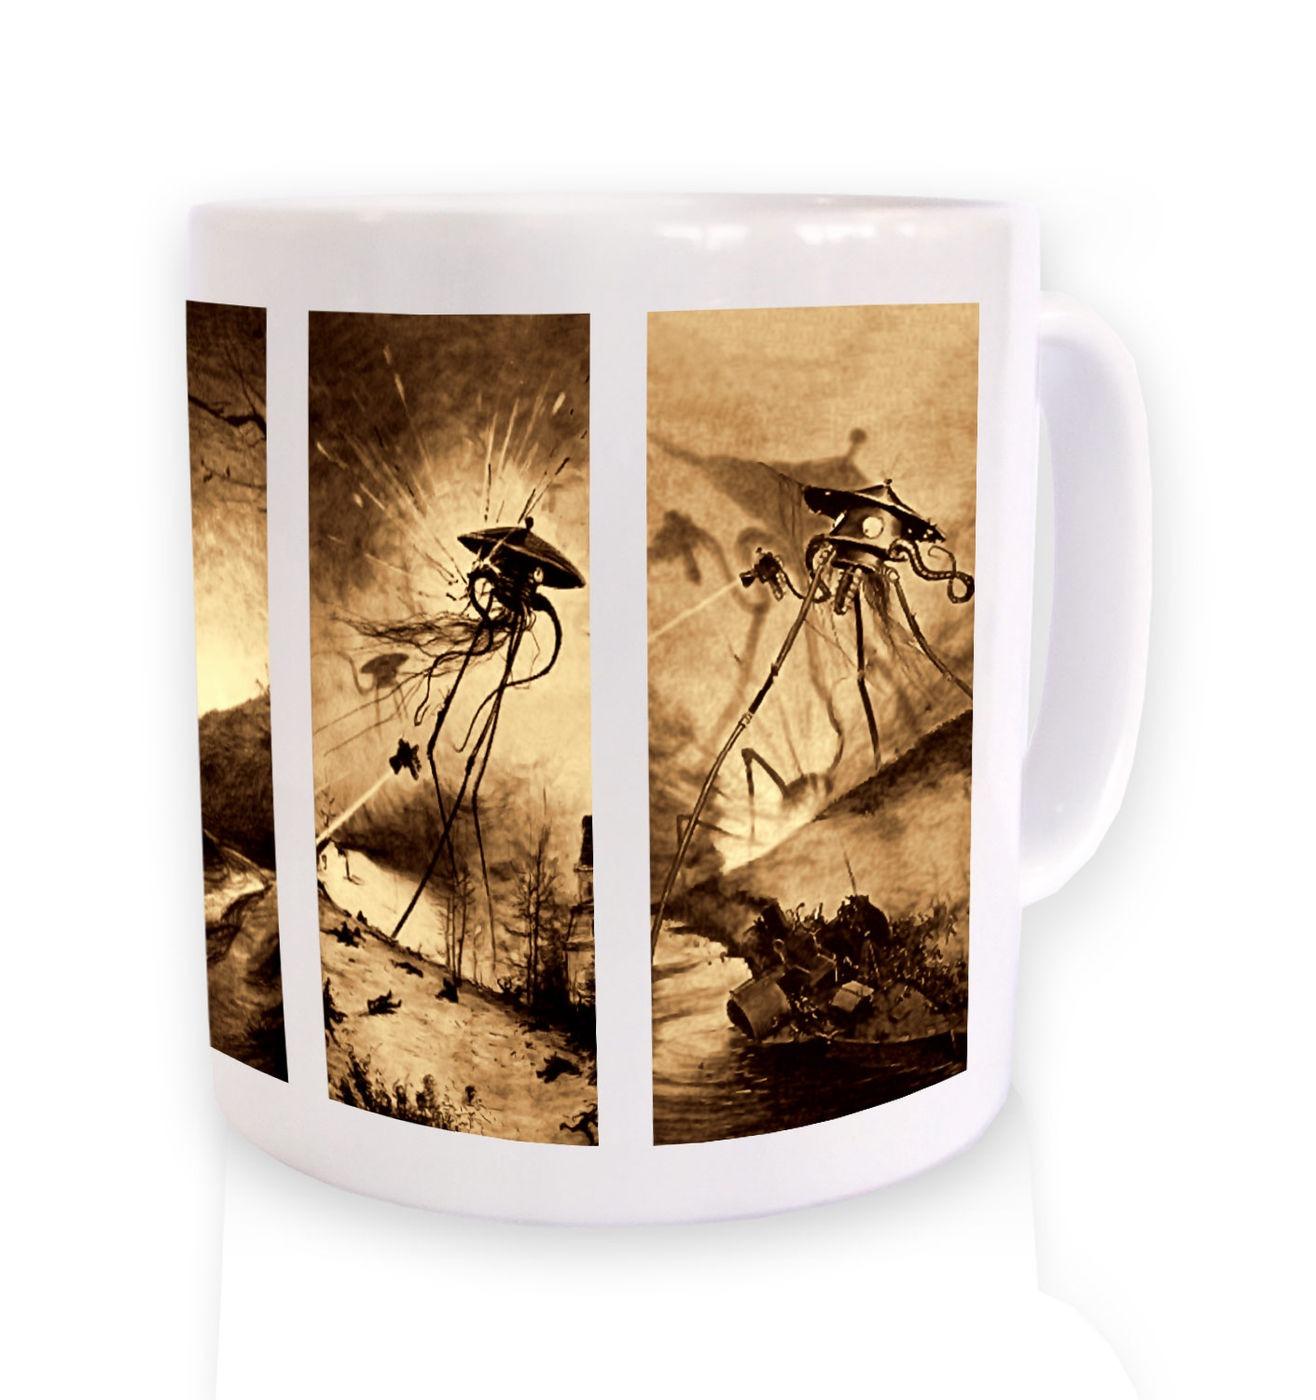 Triptych War Of The Worlds mug